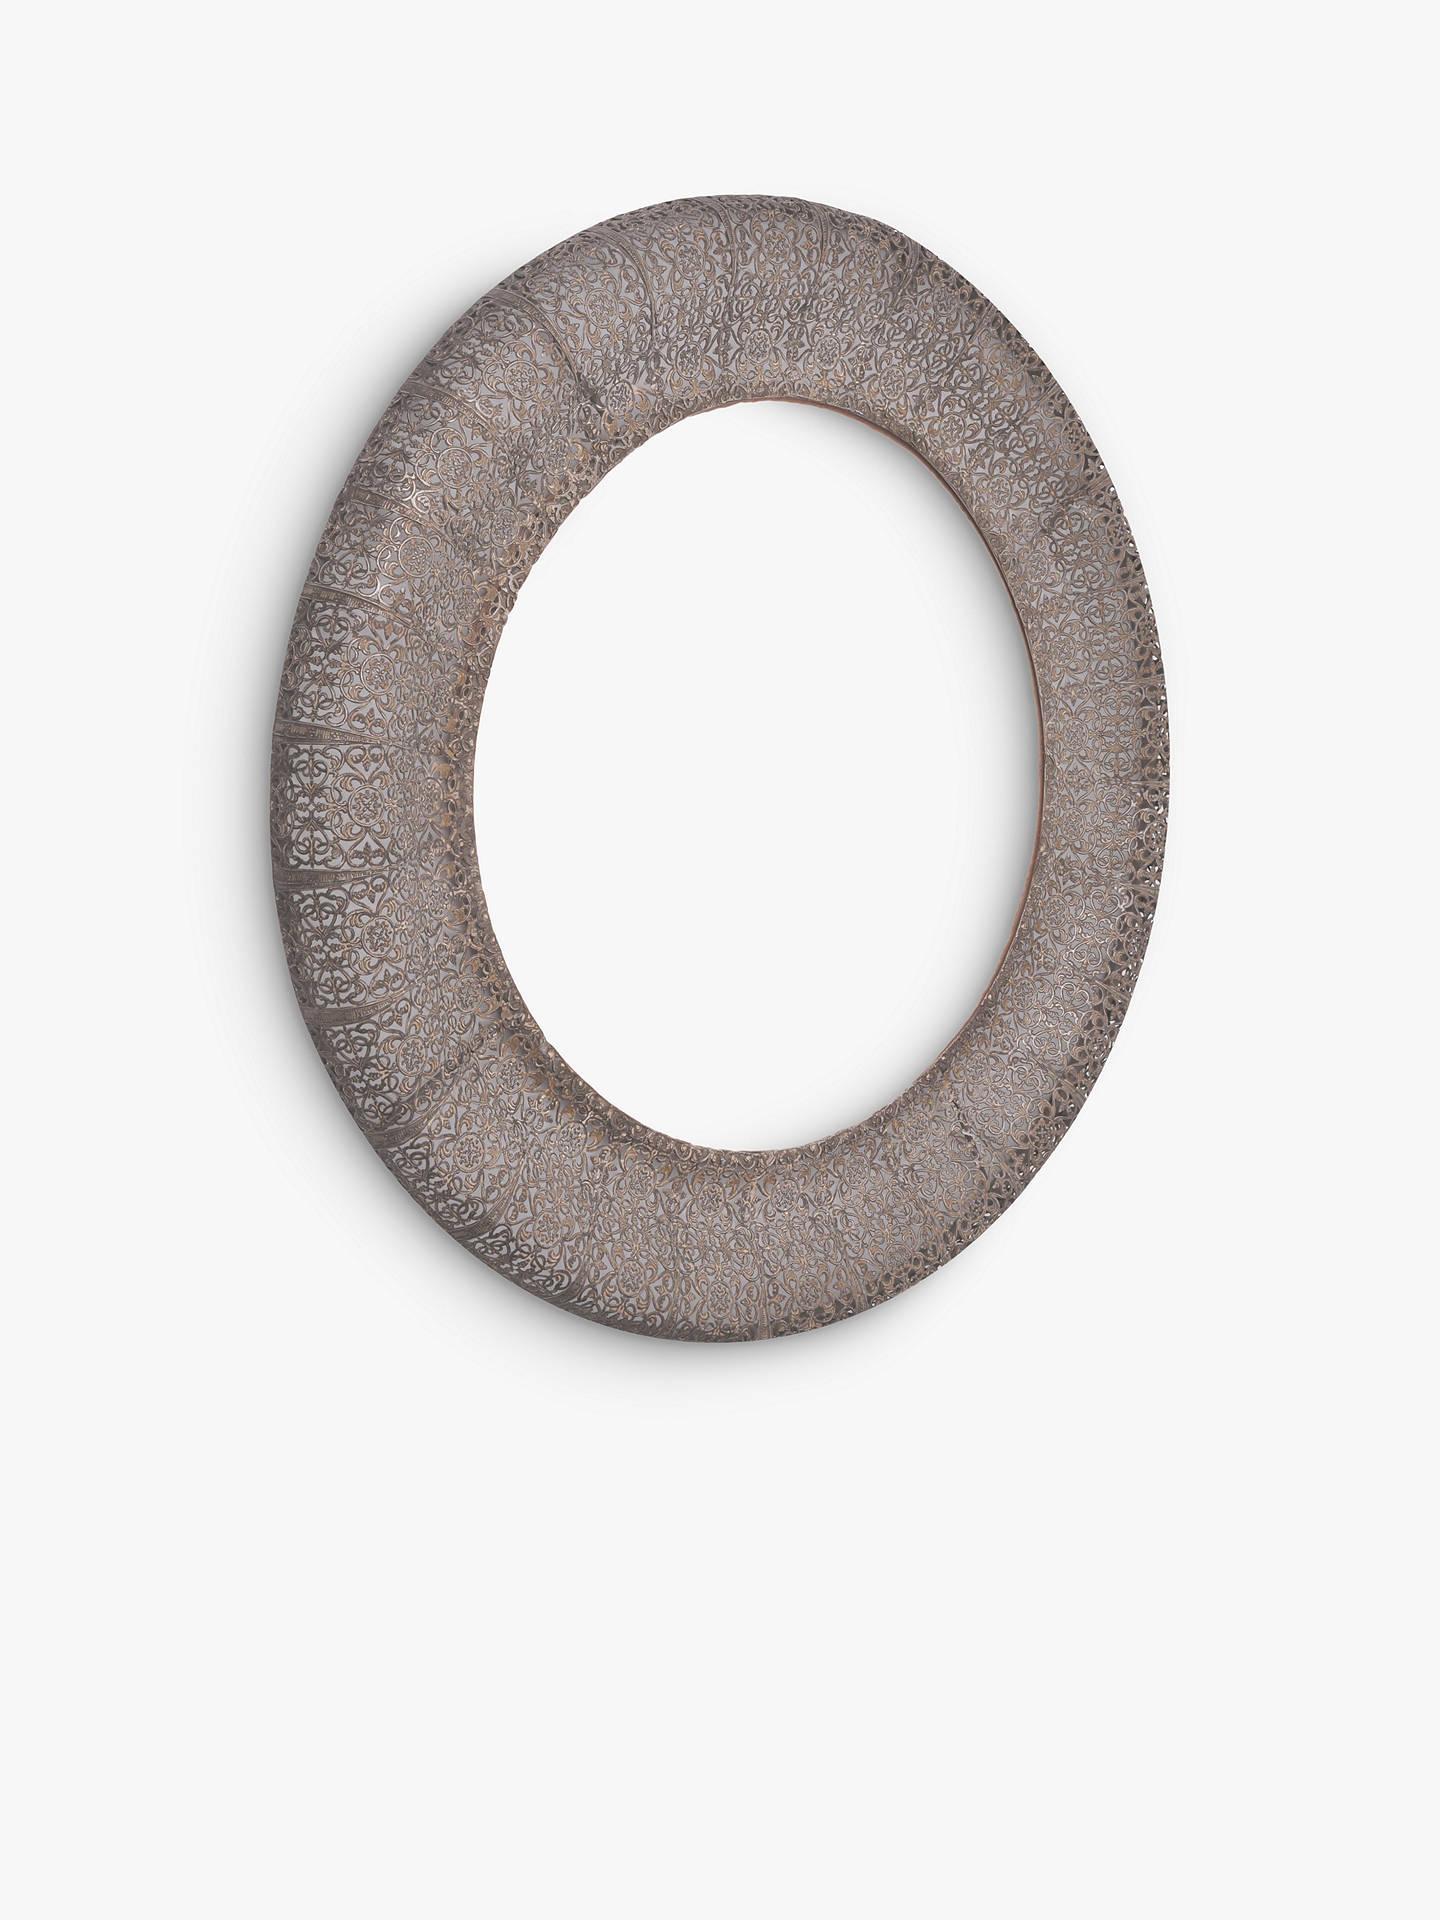 de99a8c0e7f7 Buy Libra Filigree Round Wall Mirror, 70 x 70cm, Dark Grey Online at  johnlewis ...